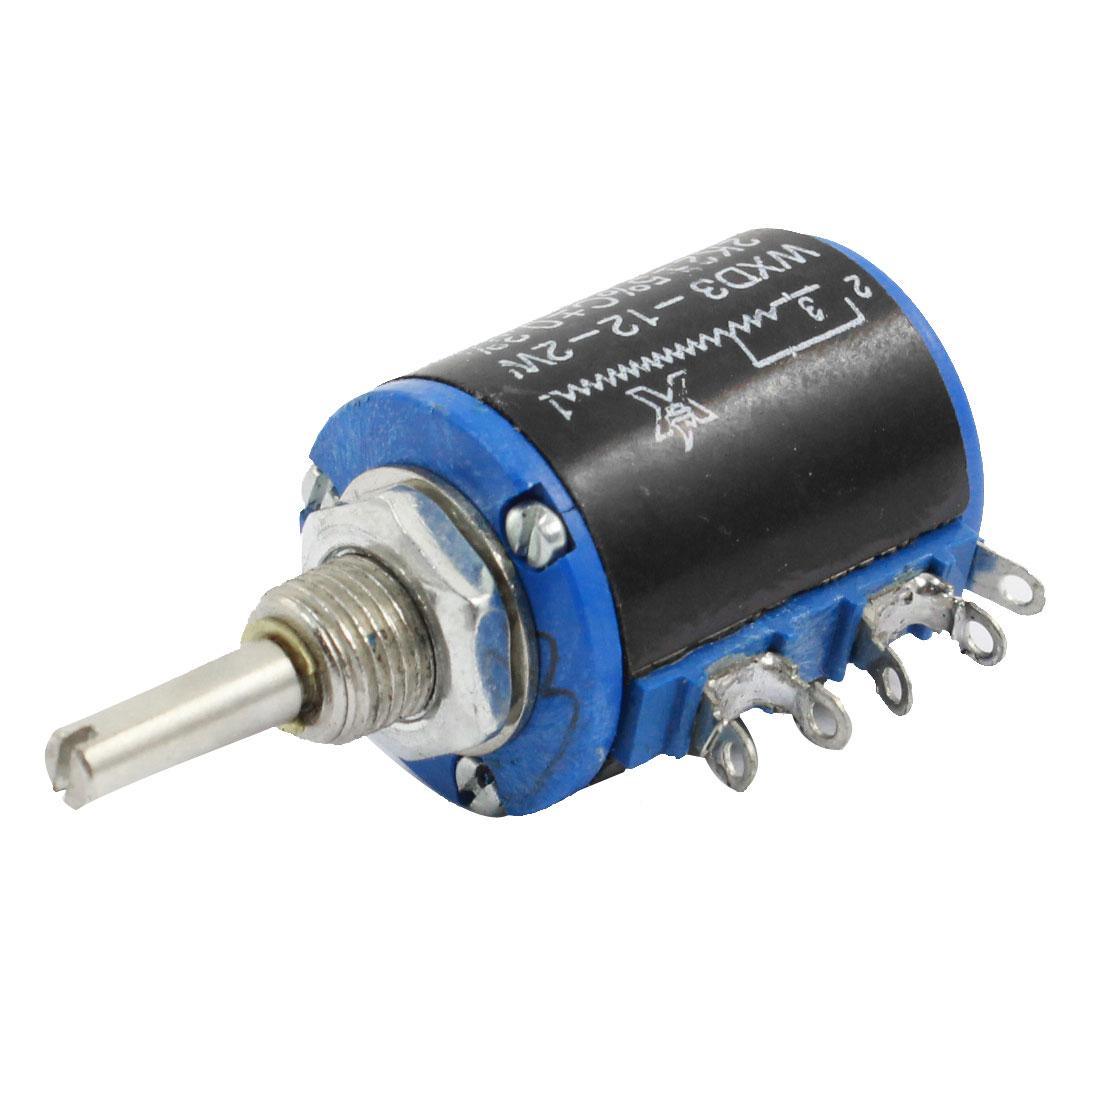 WXD3-12 2.2K Ohm 2W Rotary Wirewound Multiturn Taper Pot Potentiometer